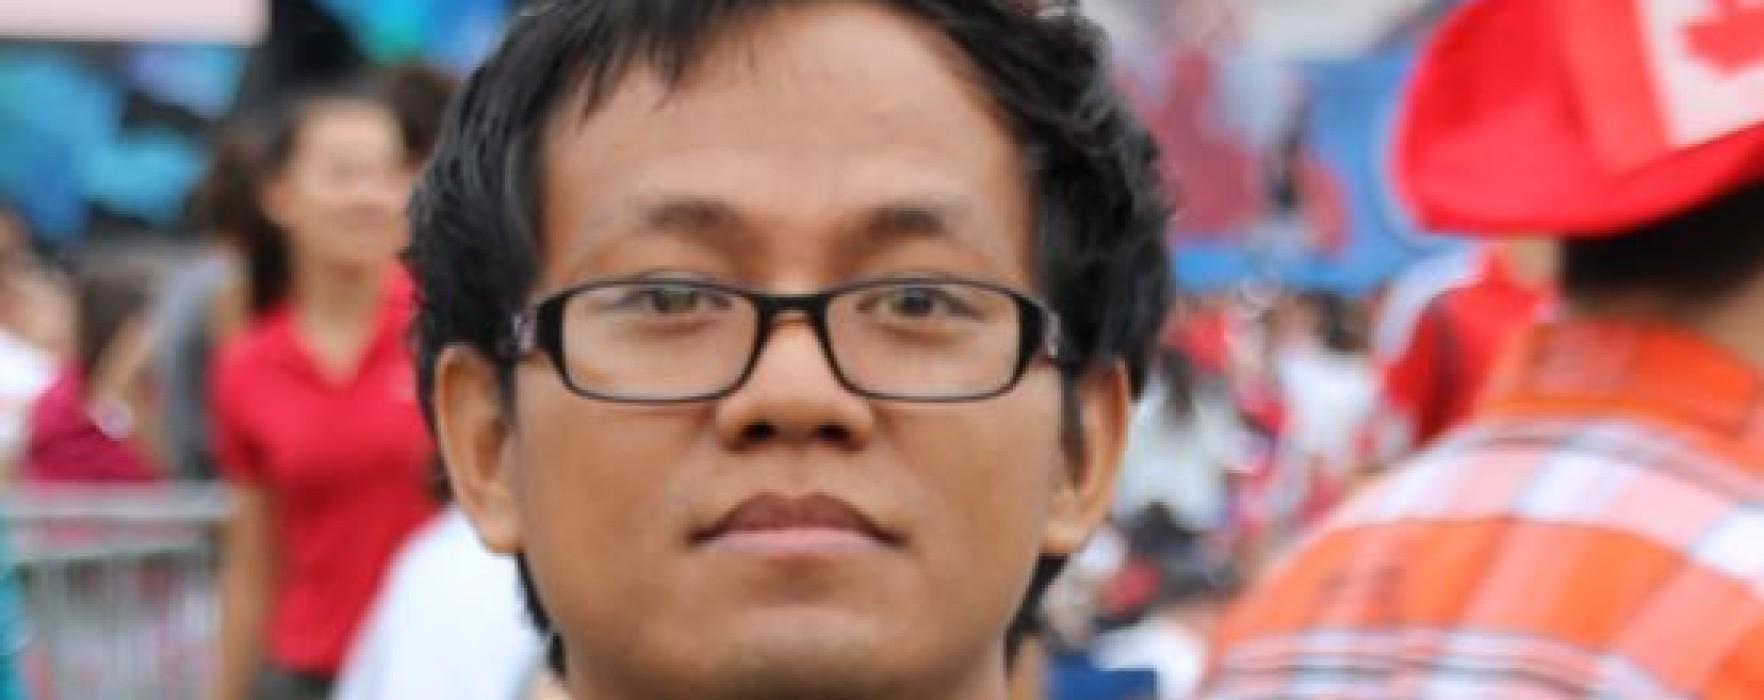 Salai Thangte: Tundung Falam Fehdan (Falam Movement)